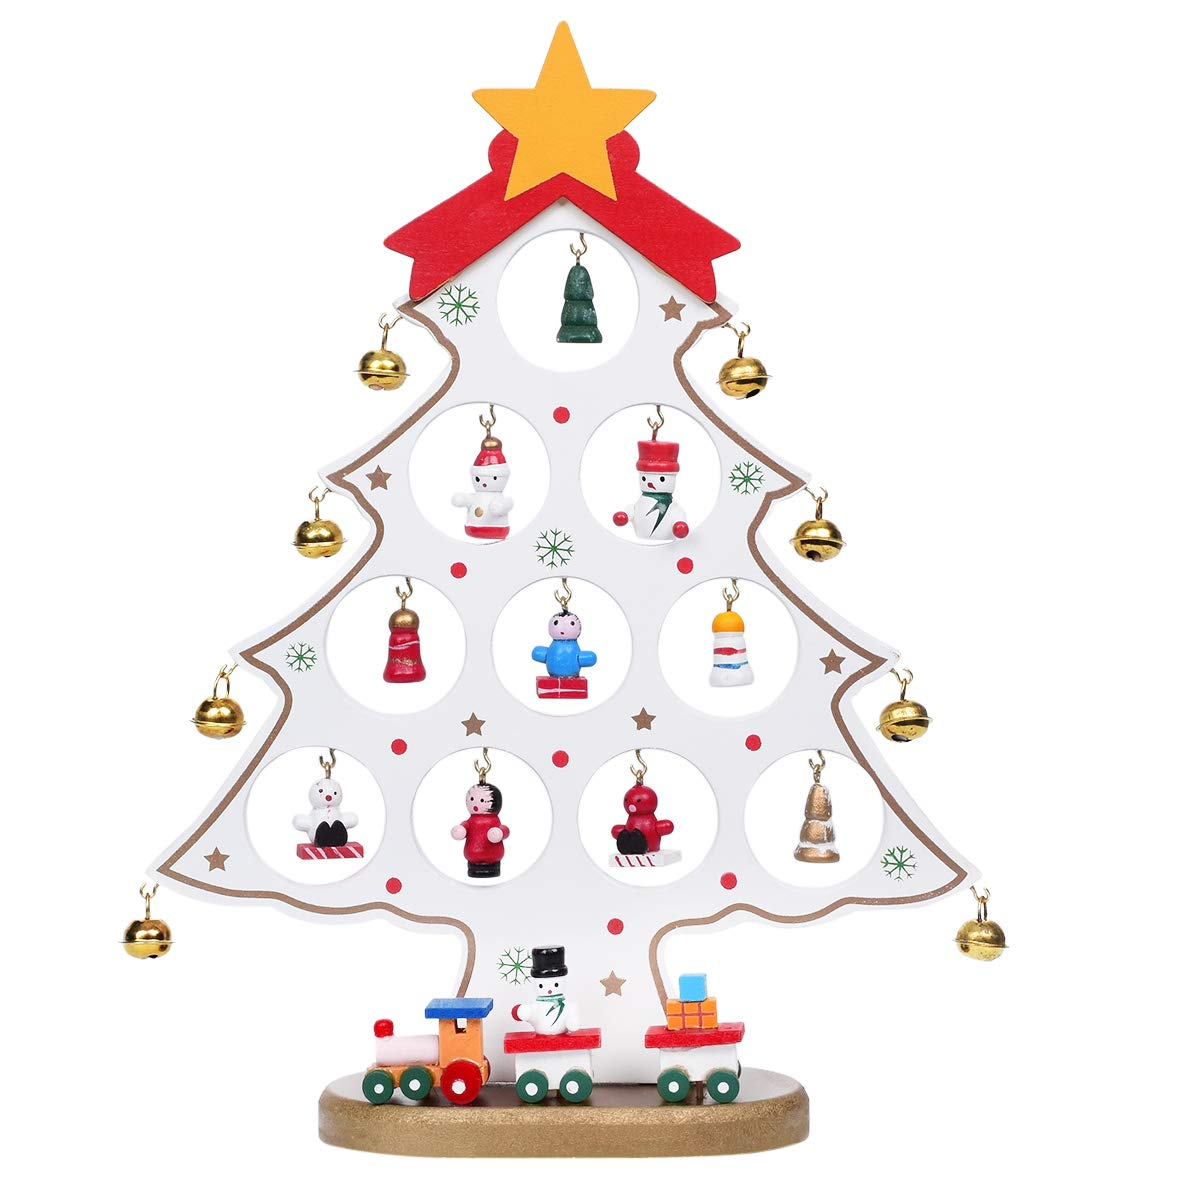 Martine Mall Wooden Desktop Mini Christmas Tree Mini Ornaments